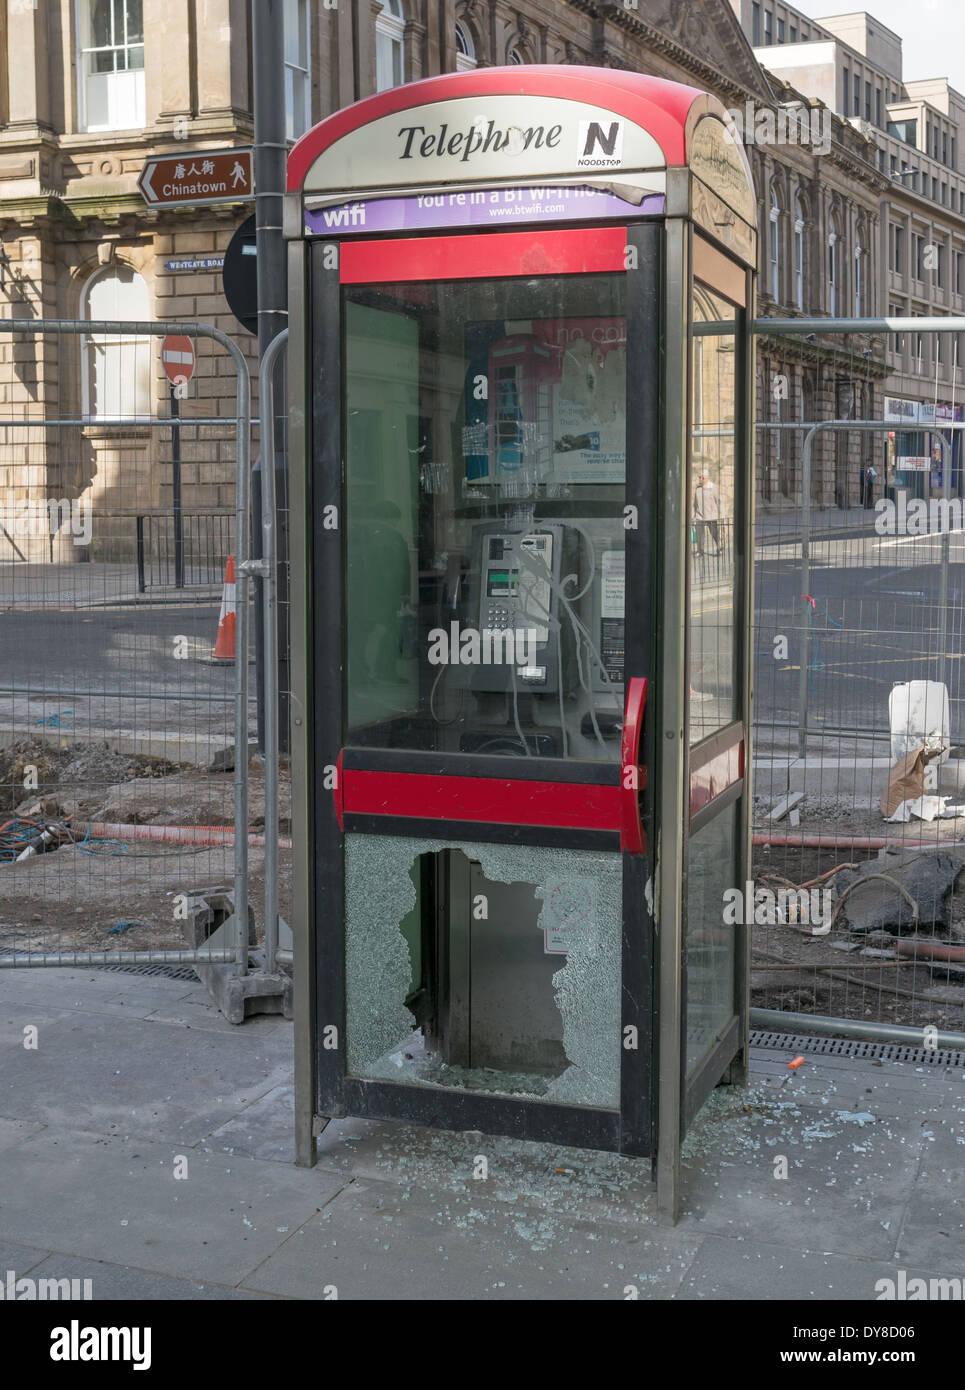 Vandalised telephone box or kiosk with broken glass door Newcastle north east England UK - Stock Image